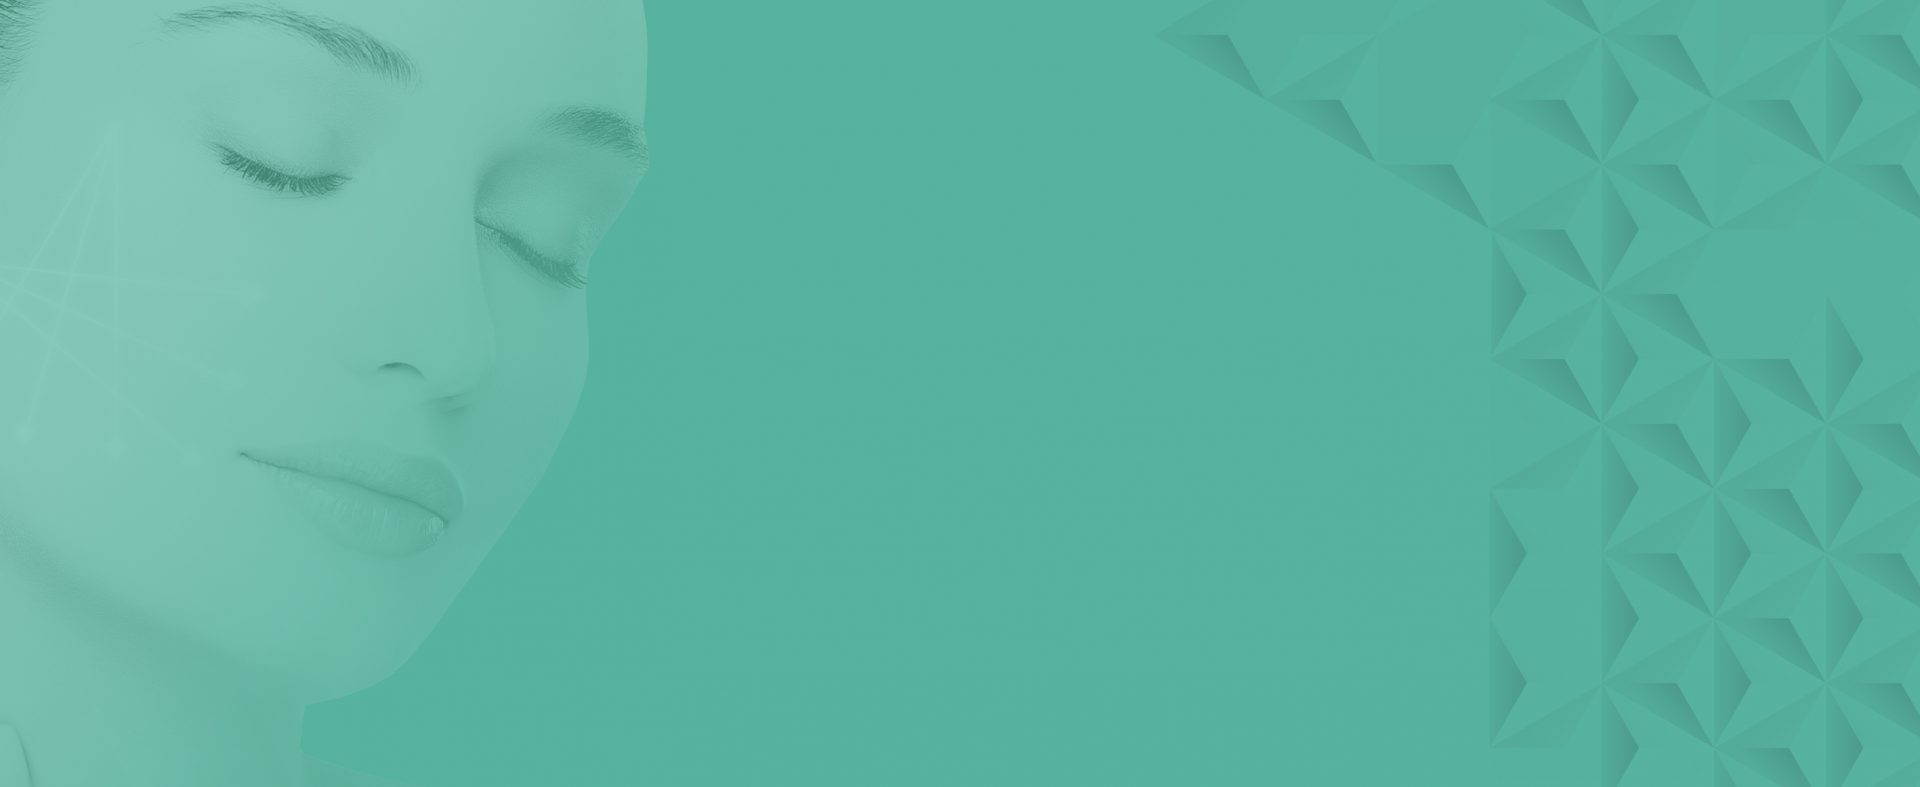 attivarf attiva fondo radiofrecuencia endodérmica combate el envejecimiento, flacidez, grasa, celulitis. Belium Medical distribuidor oficial españa